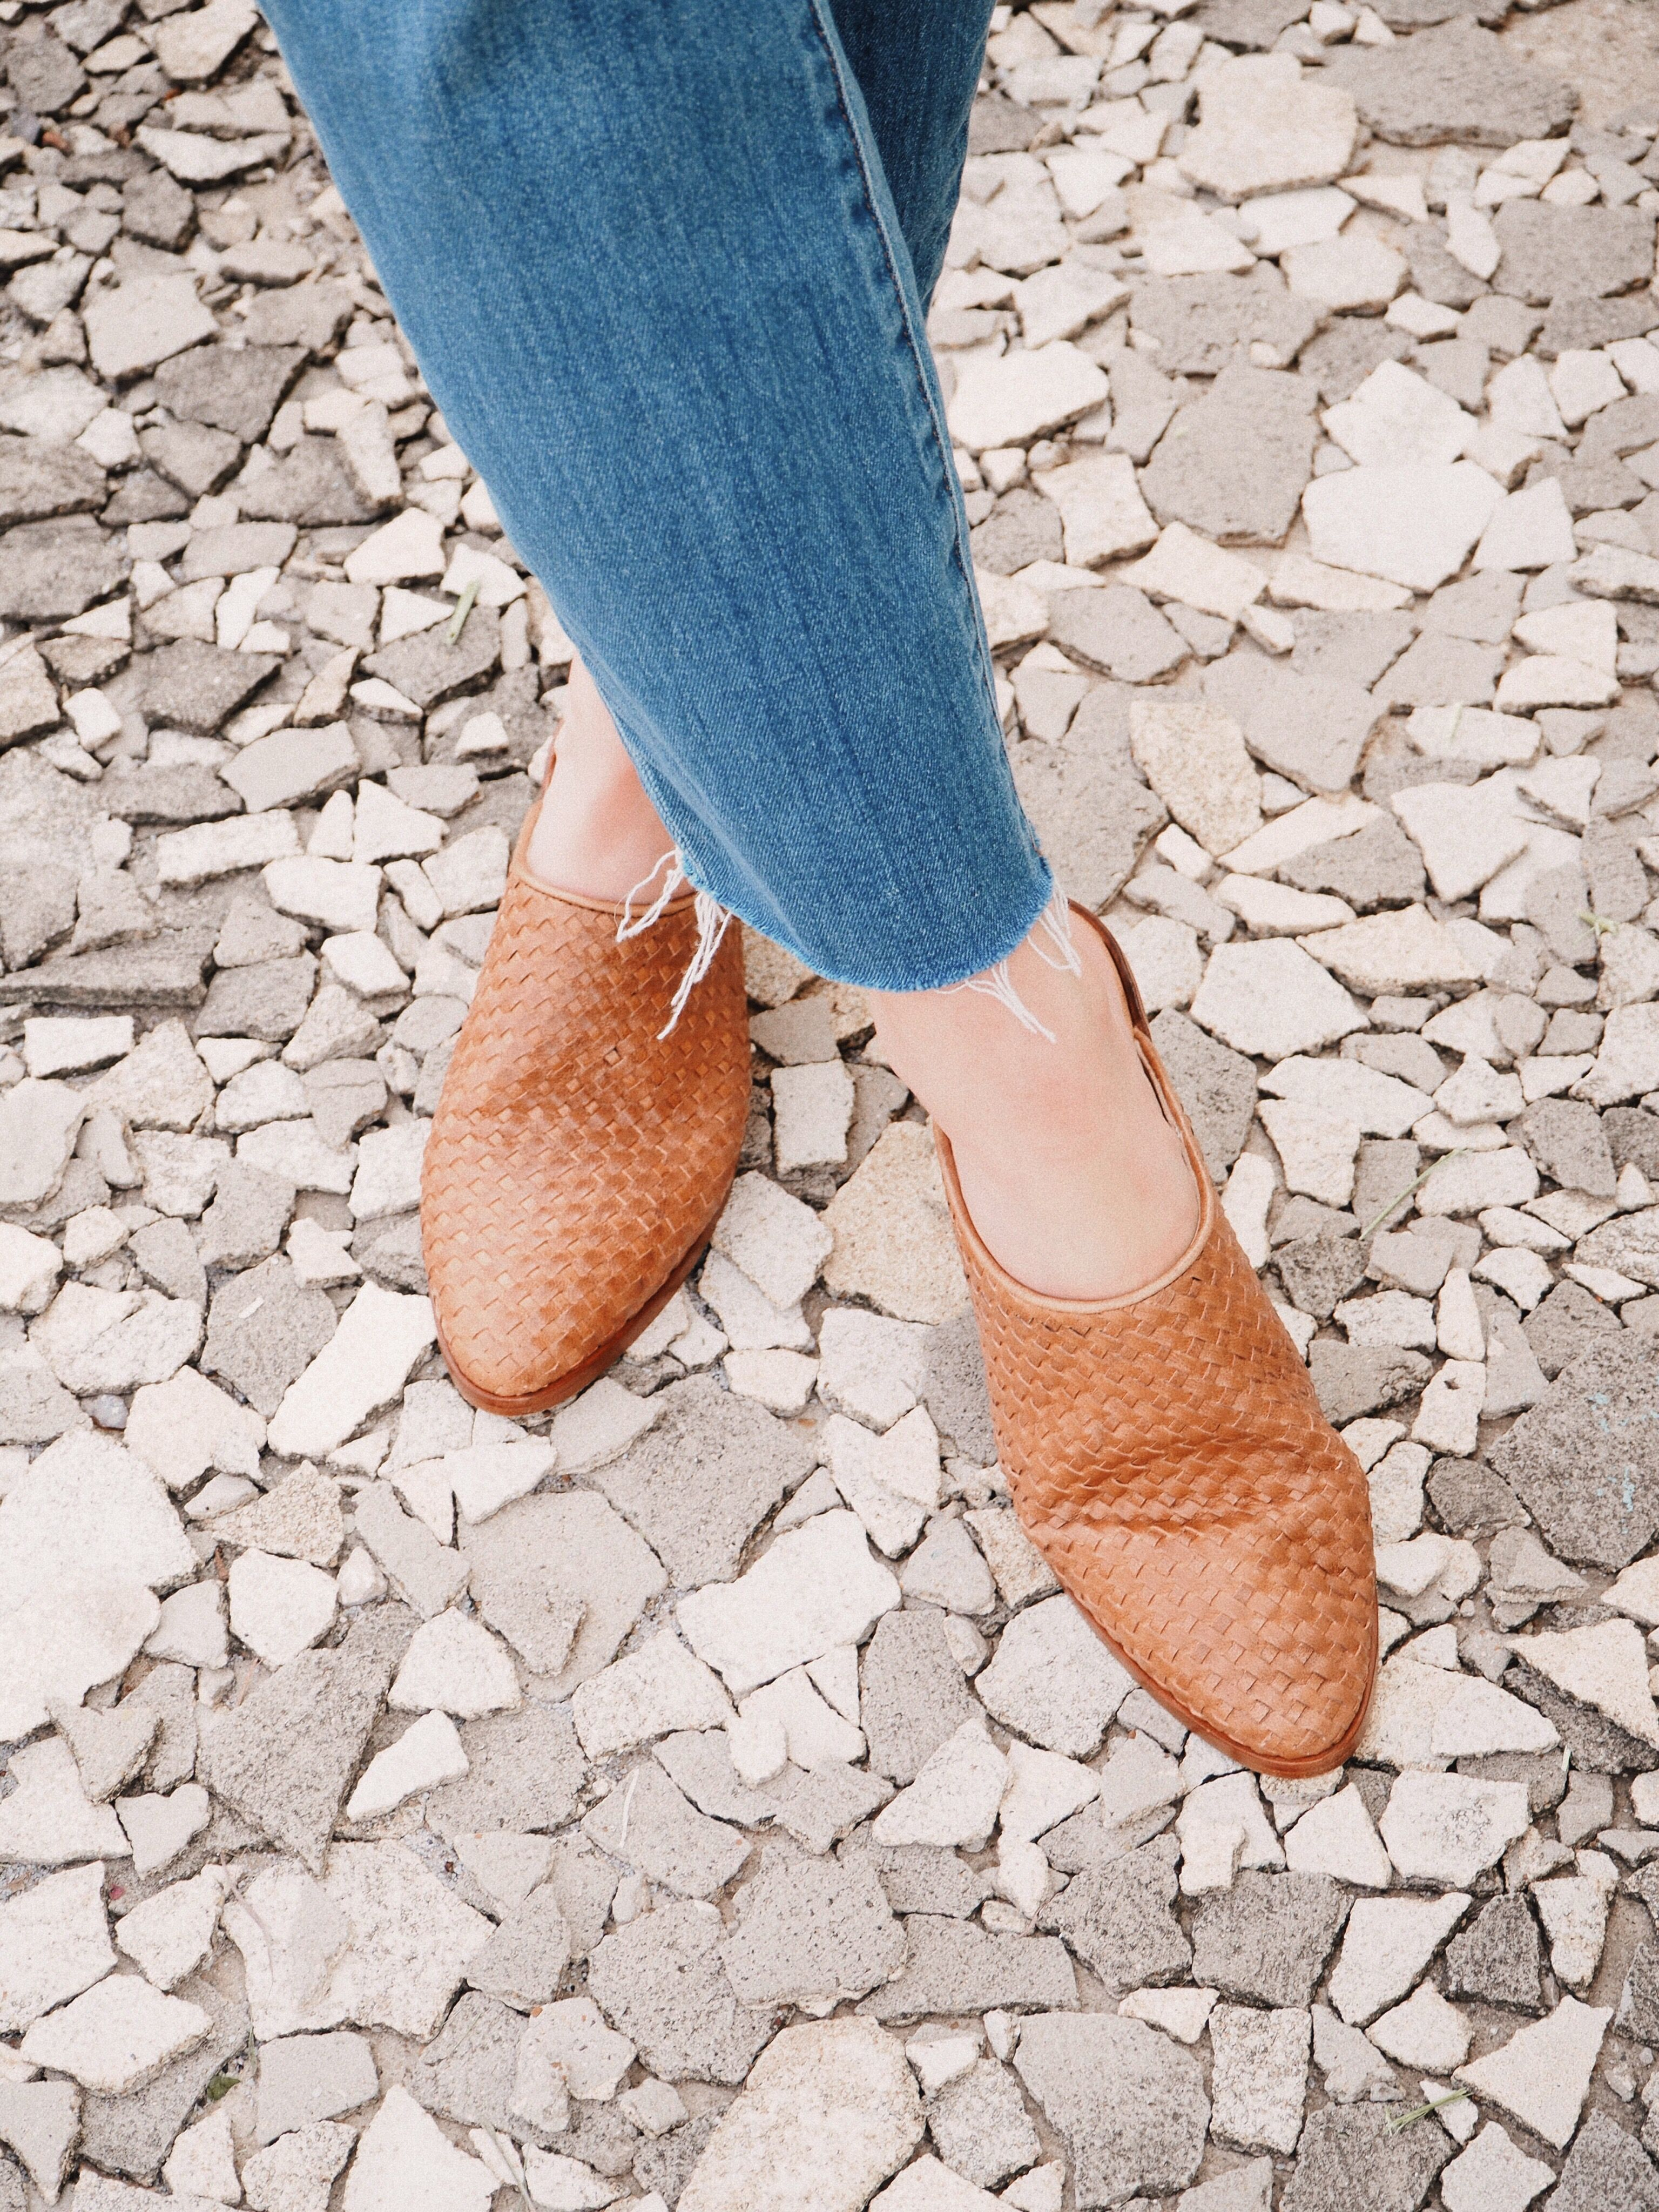 Pin by Nancy Bortz on Raspberry Beret | Fashion, Red shoes